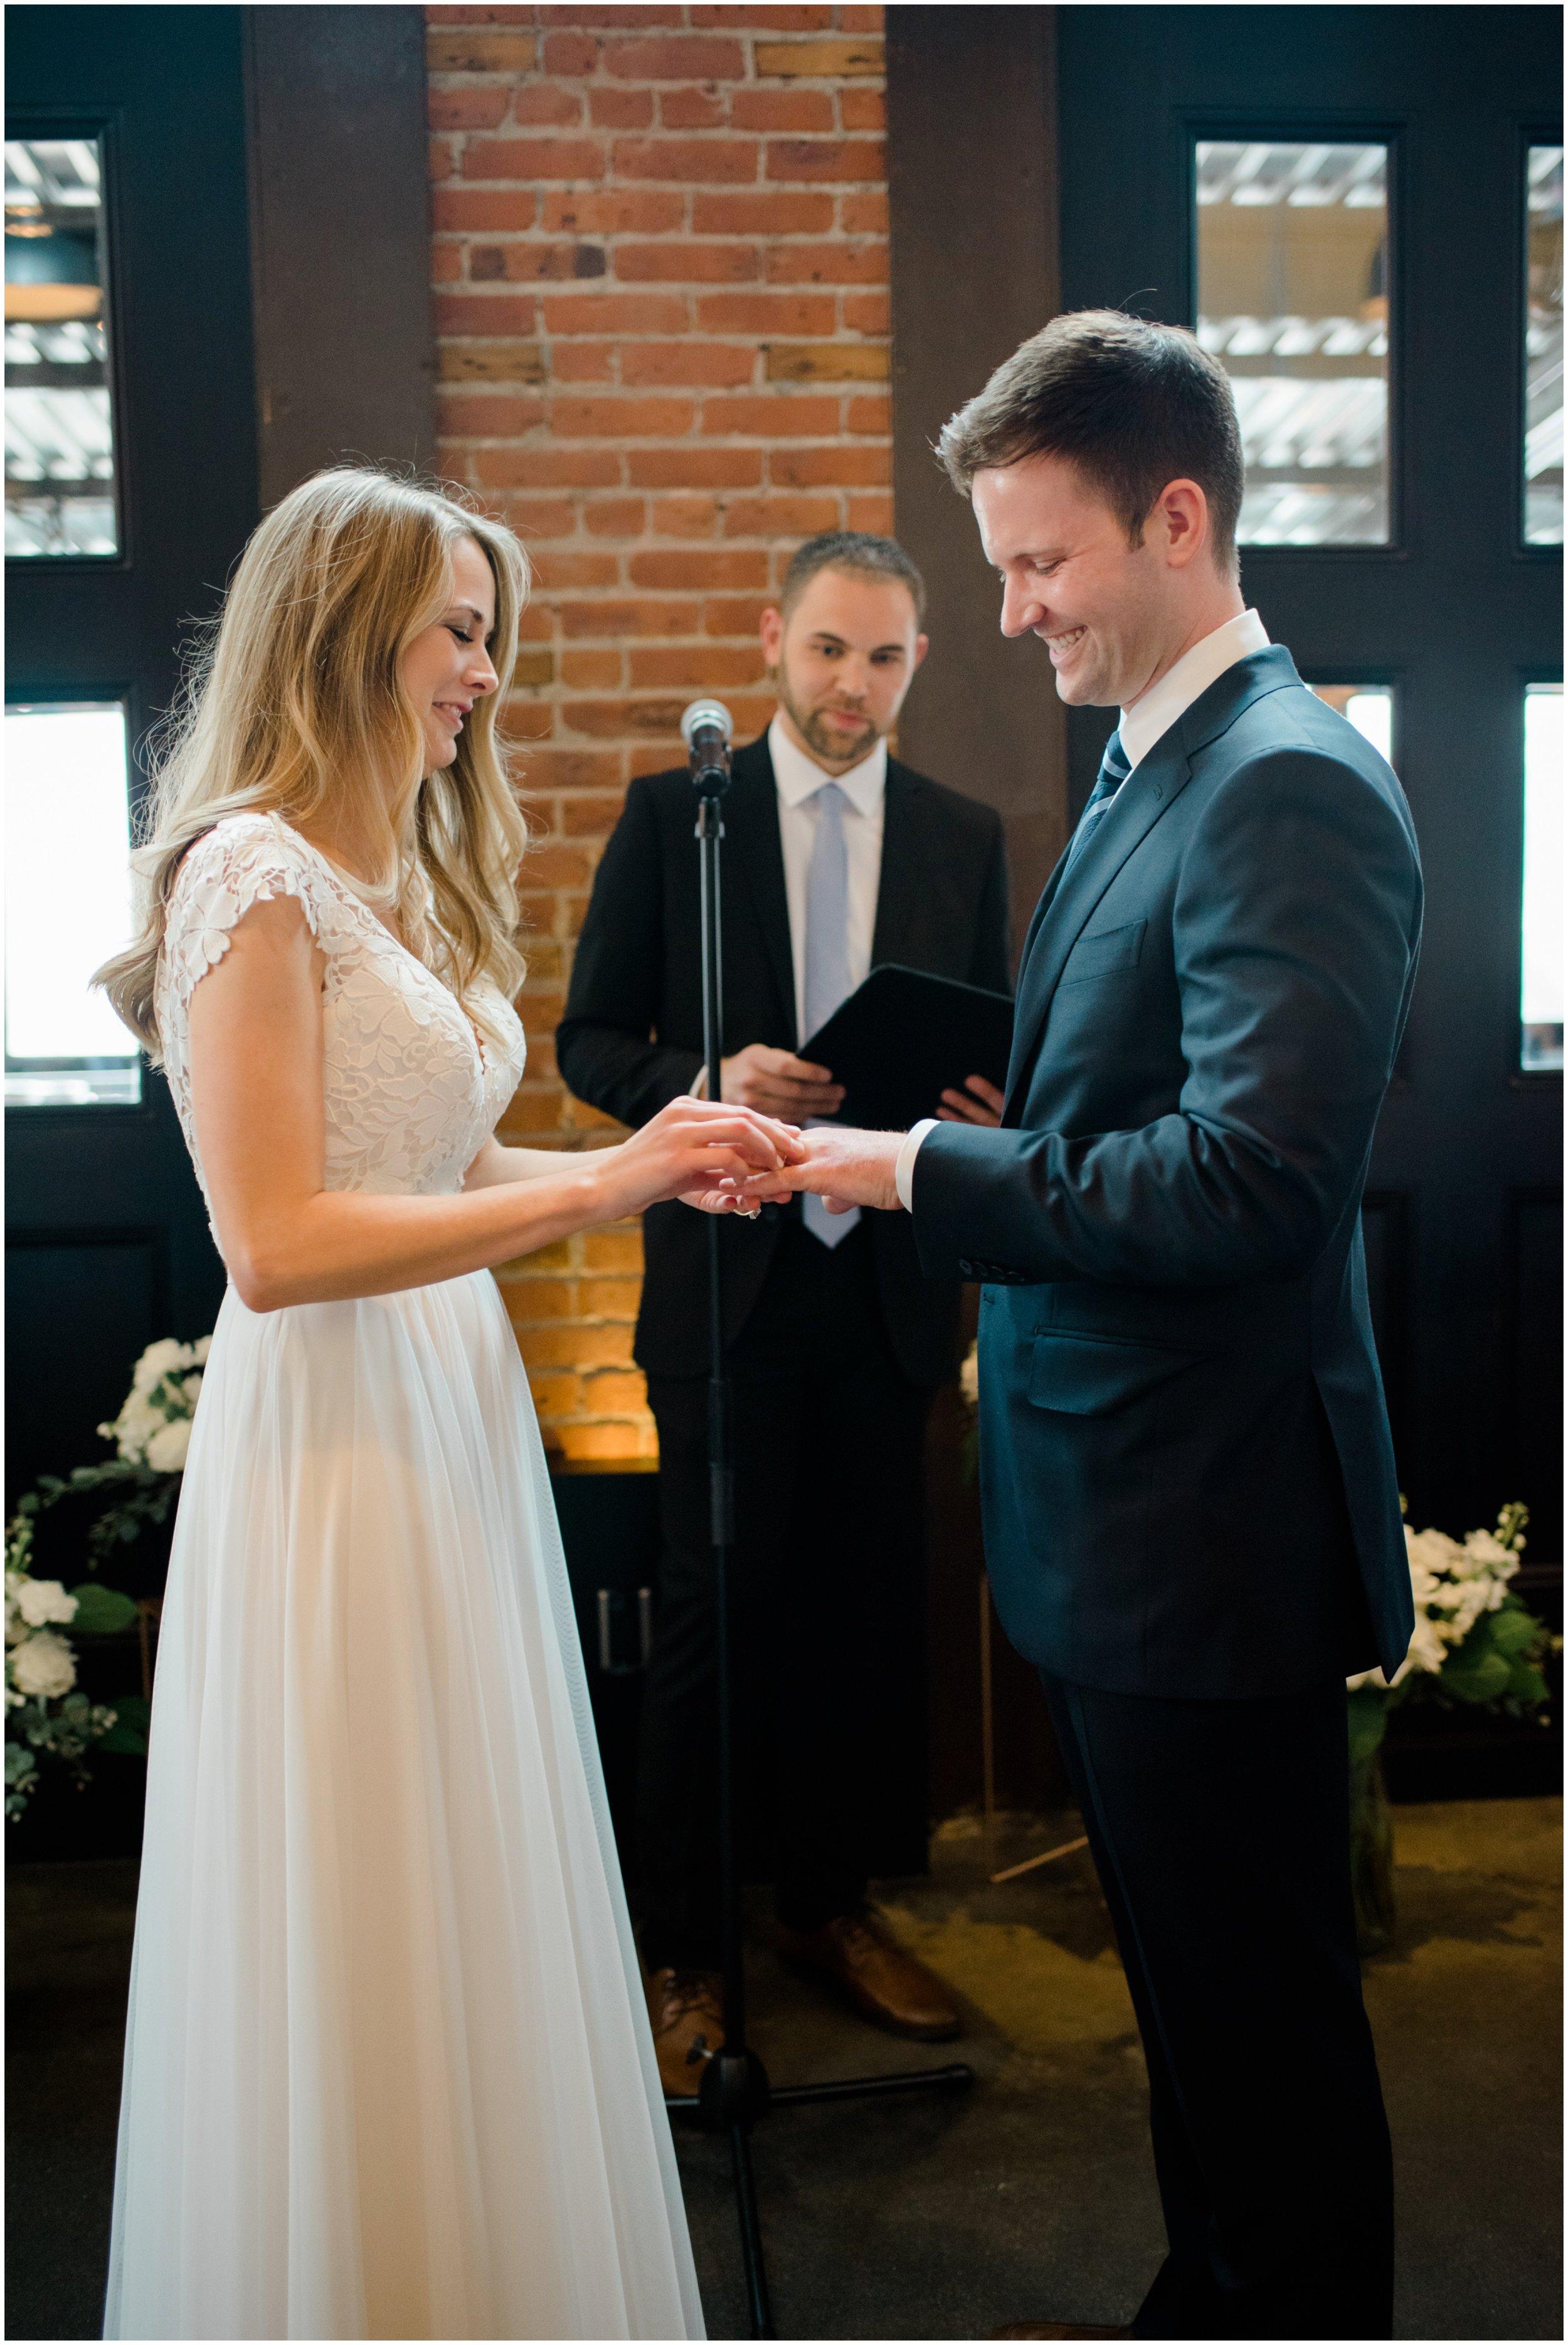 jay-robin-married-row-34-boston-32.jpg